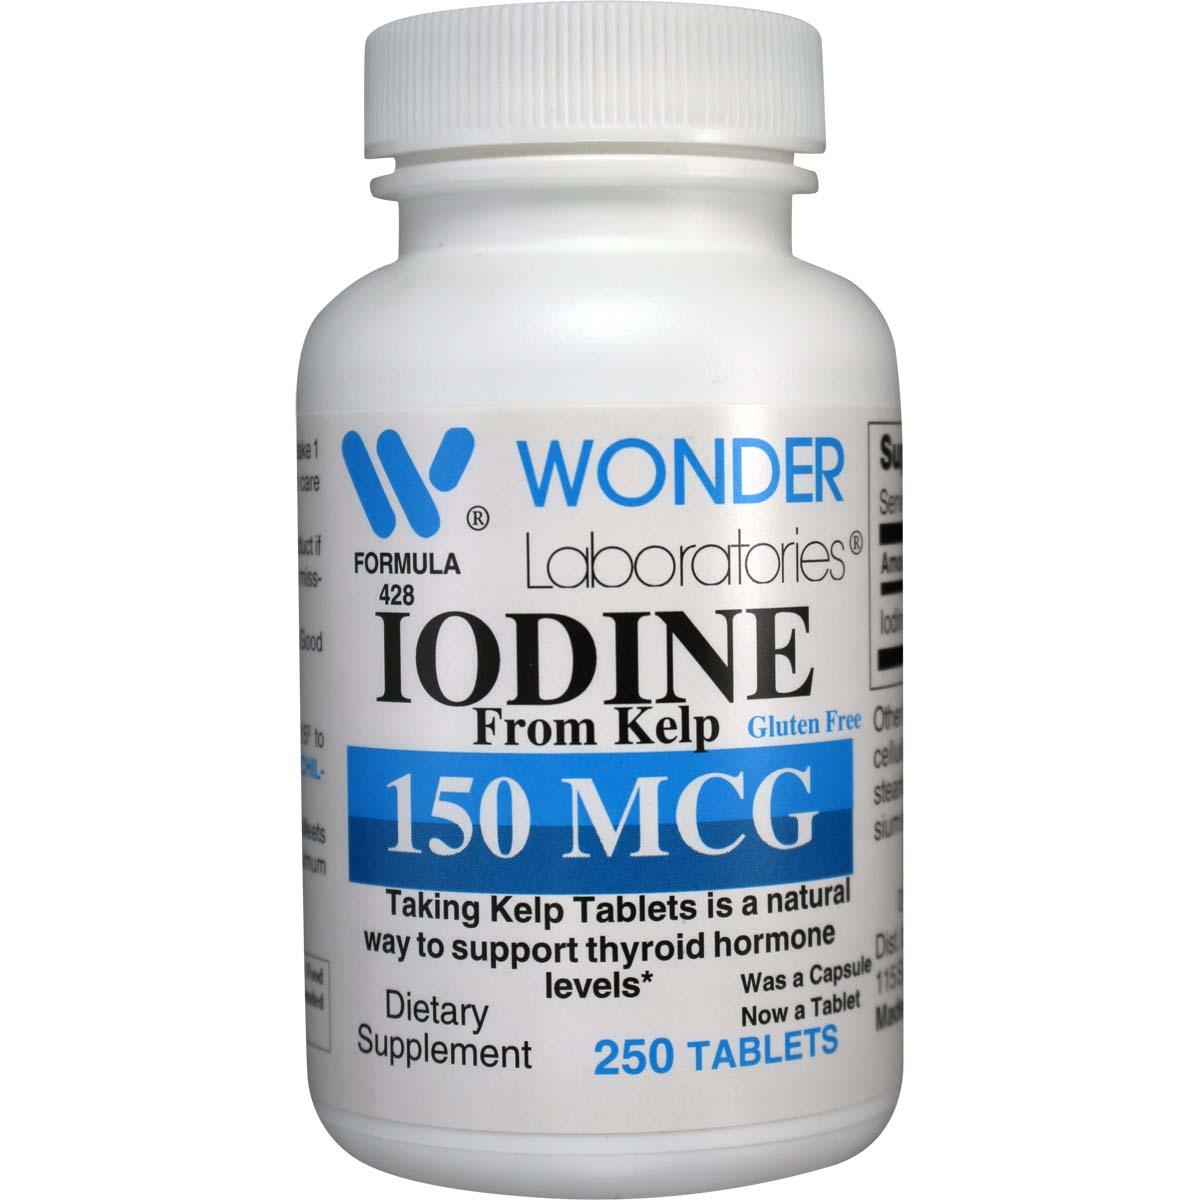 Iodine From Kelp 150 Mcg 250 Tablets Item 4282